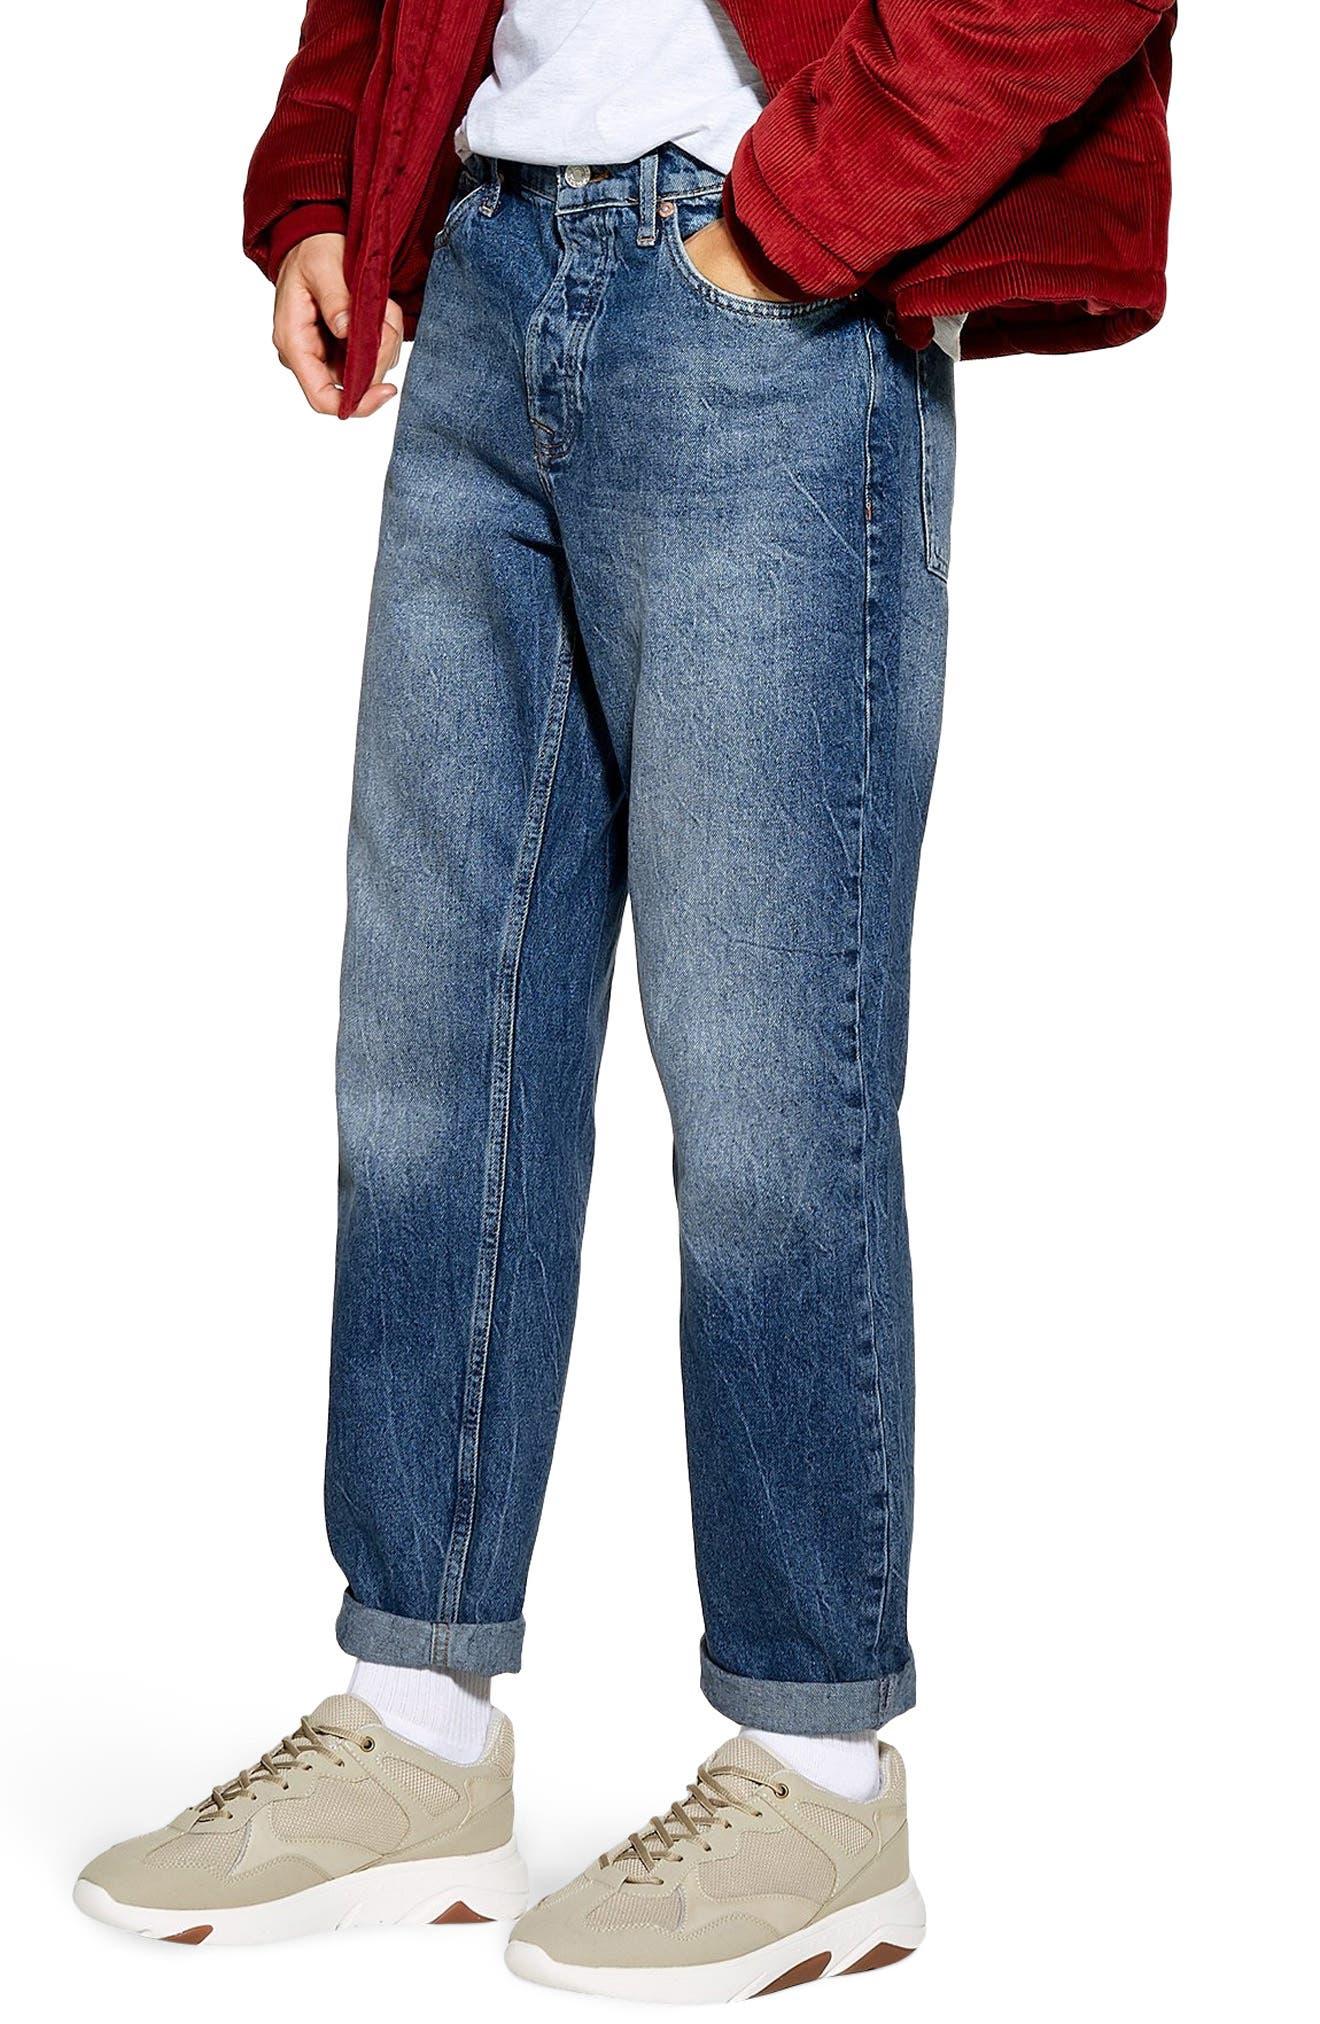 TOPMAN Billy Original Fit Jeans, Main, color, BLUE